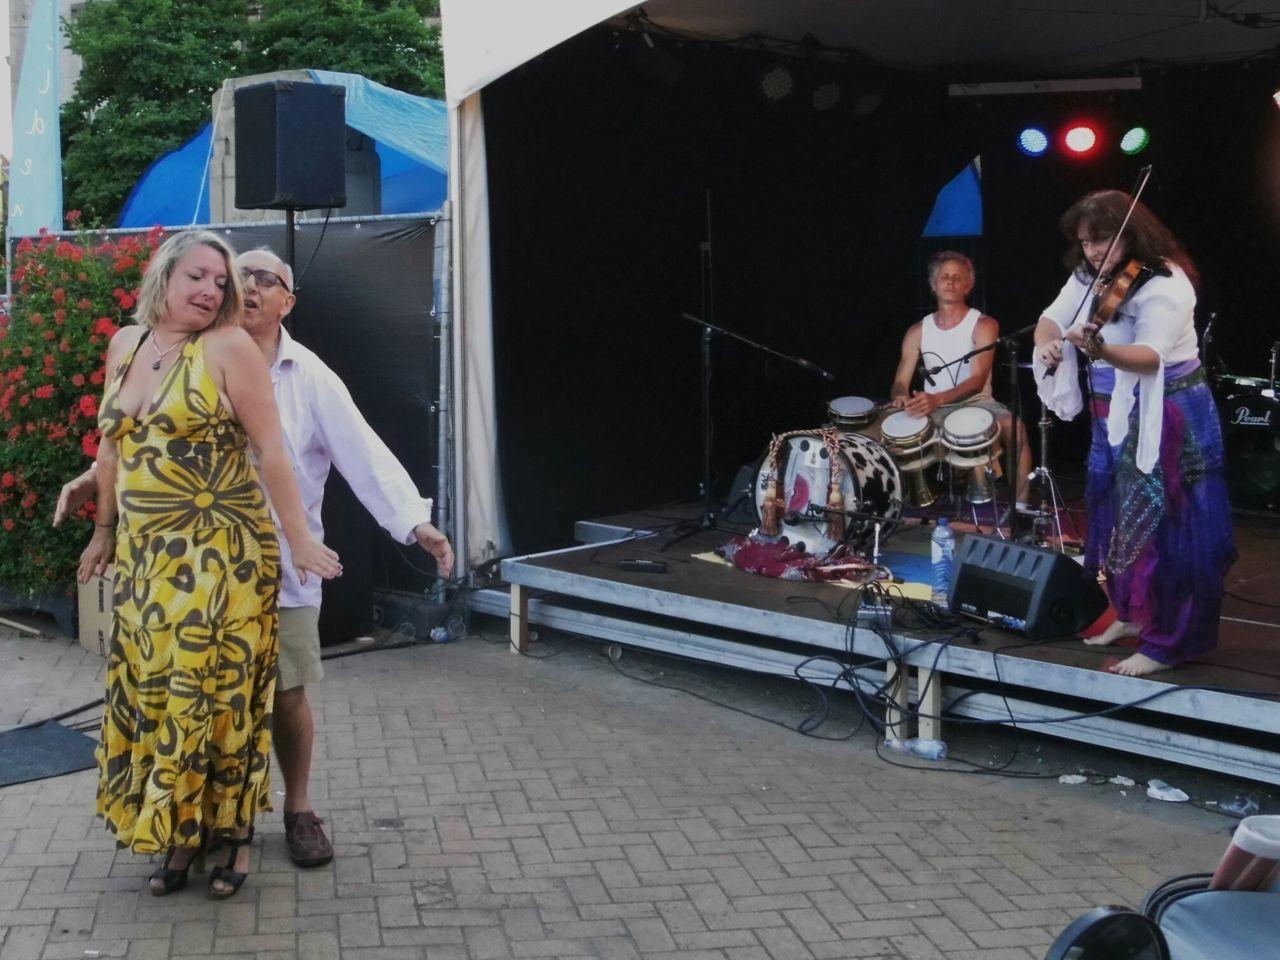 Shaking Hips Dancing Concert Music Getting Inspired Music People Life Music Dancing